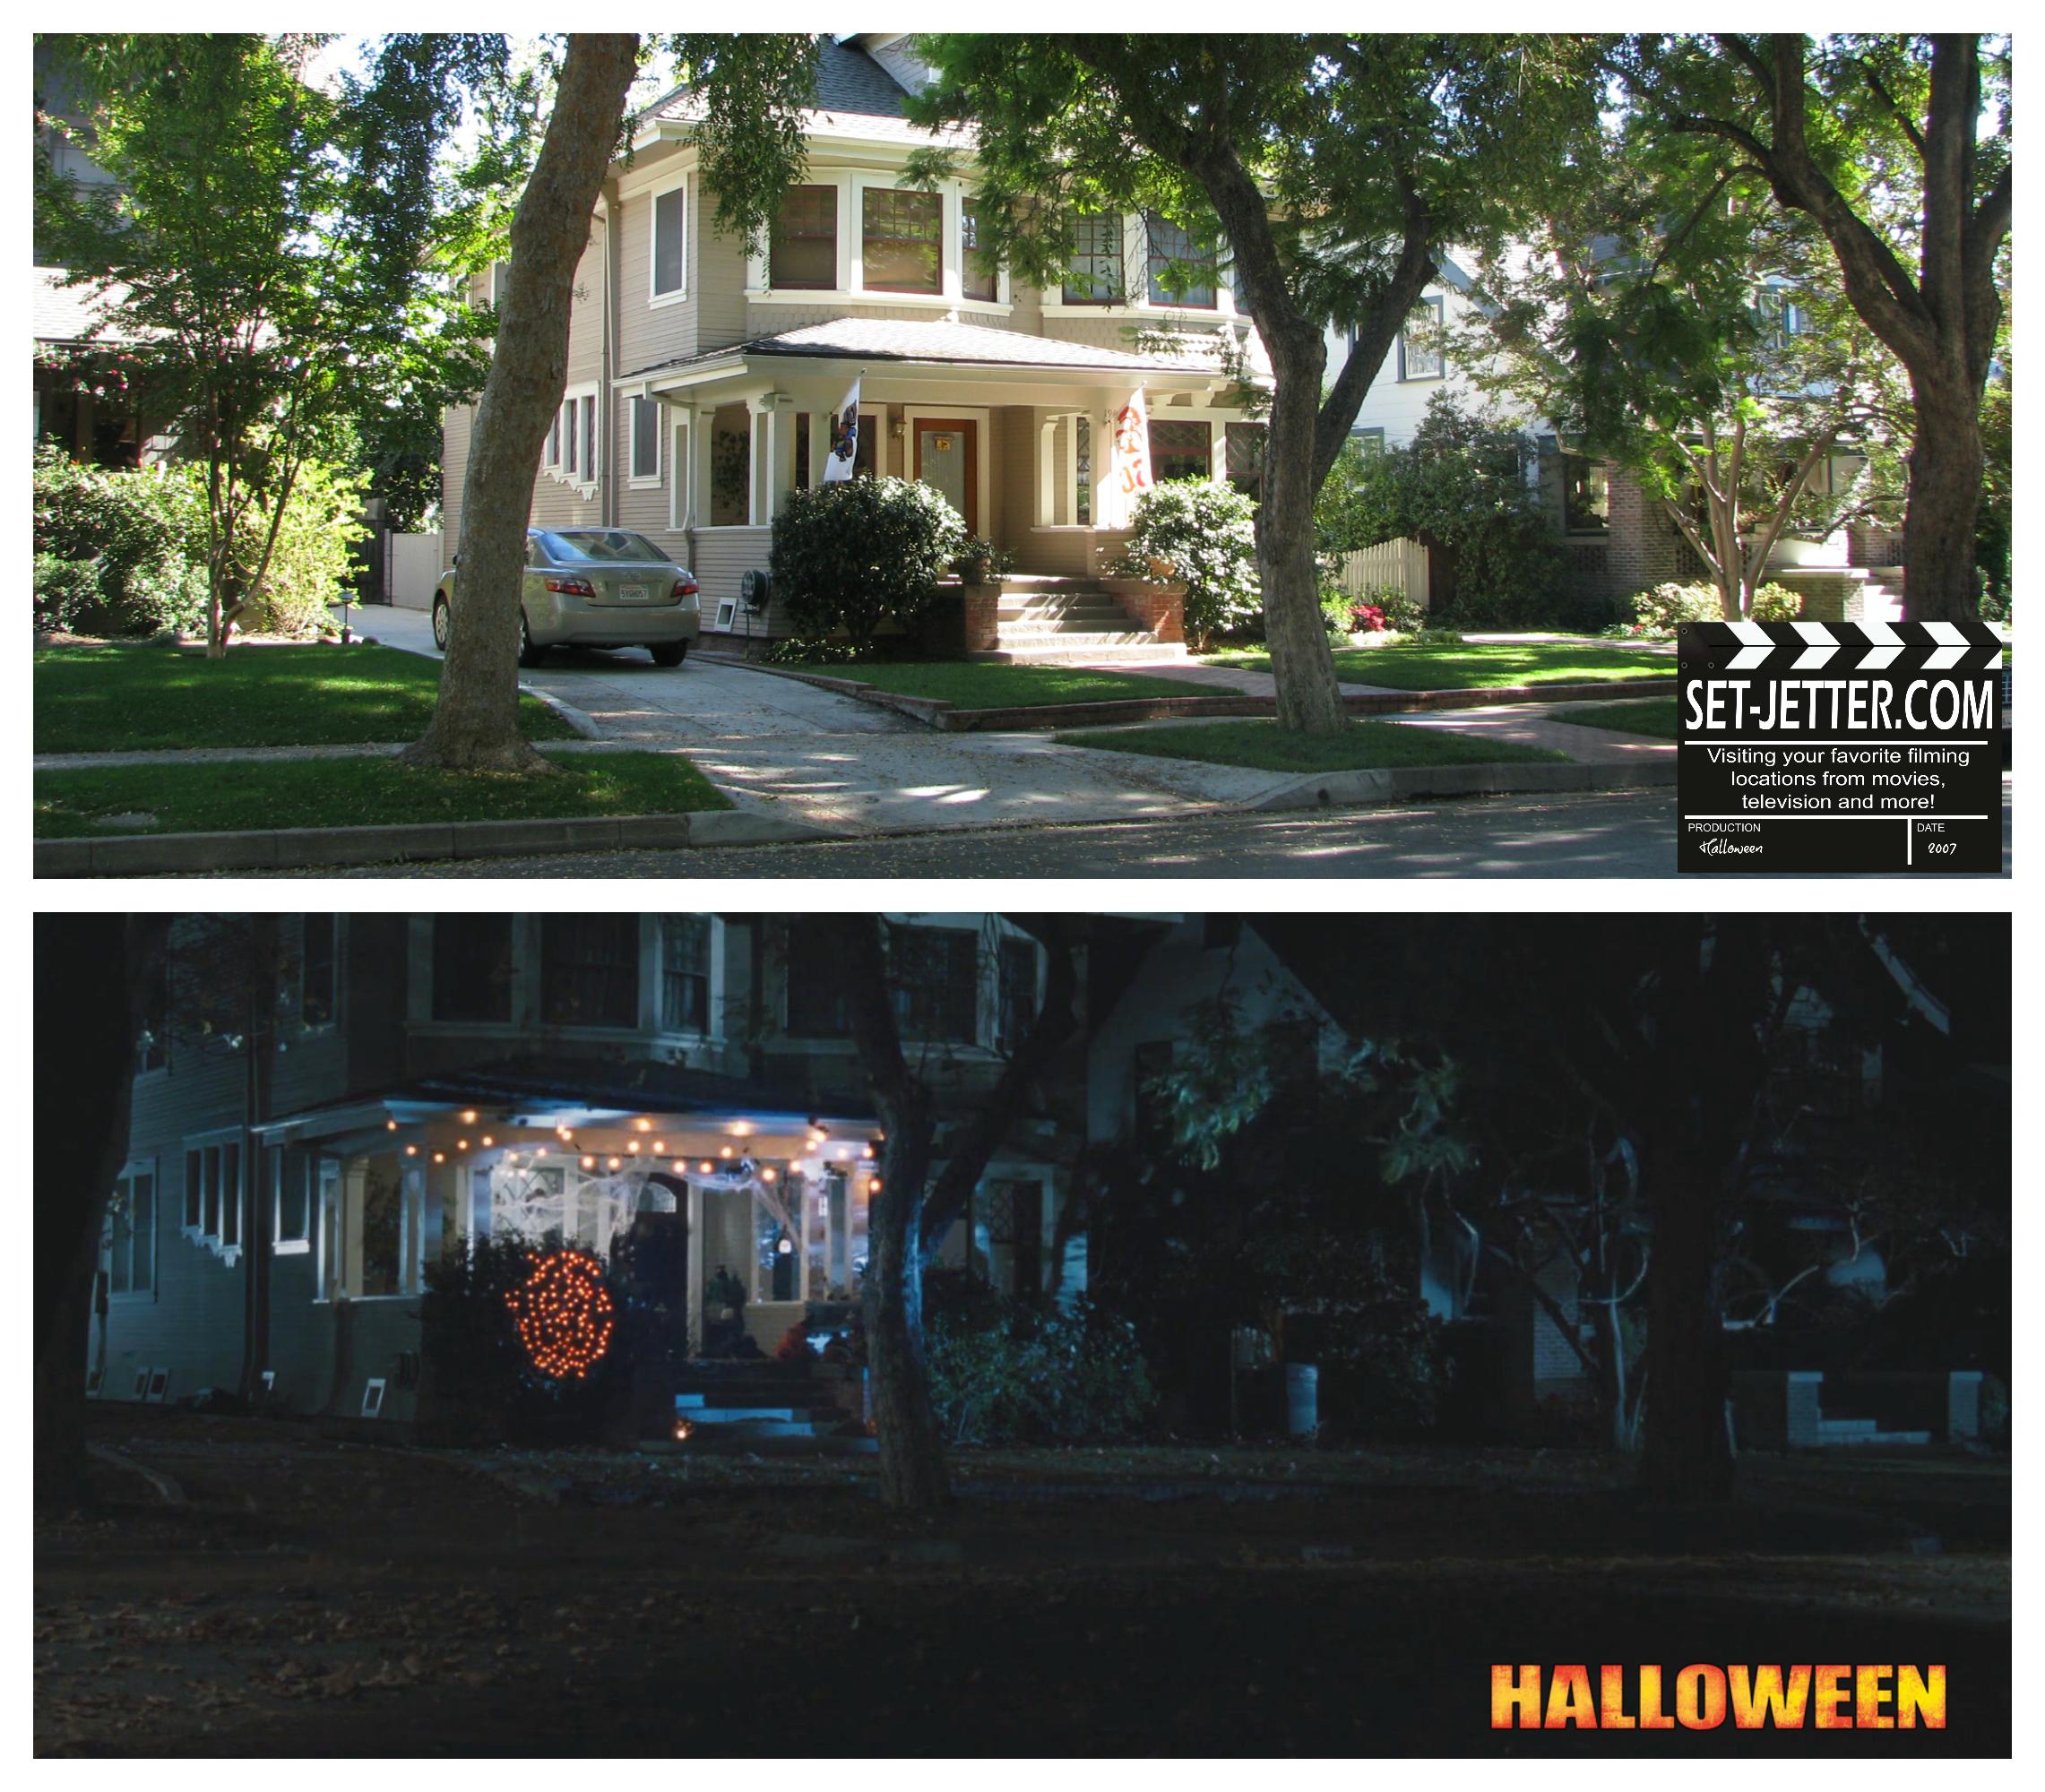 Halloween 2007 comparison 57.jpg